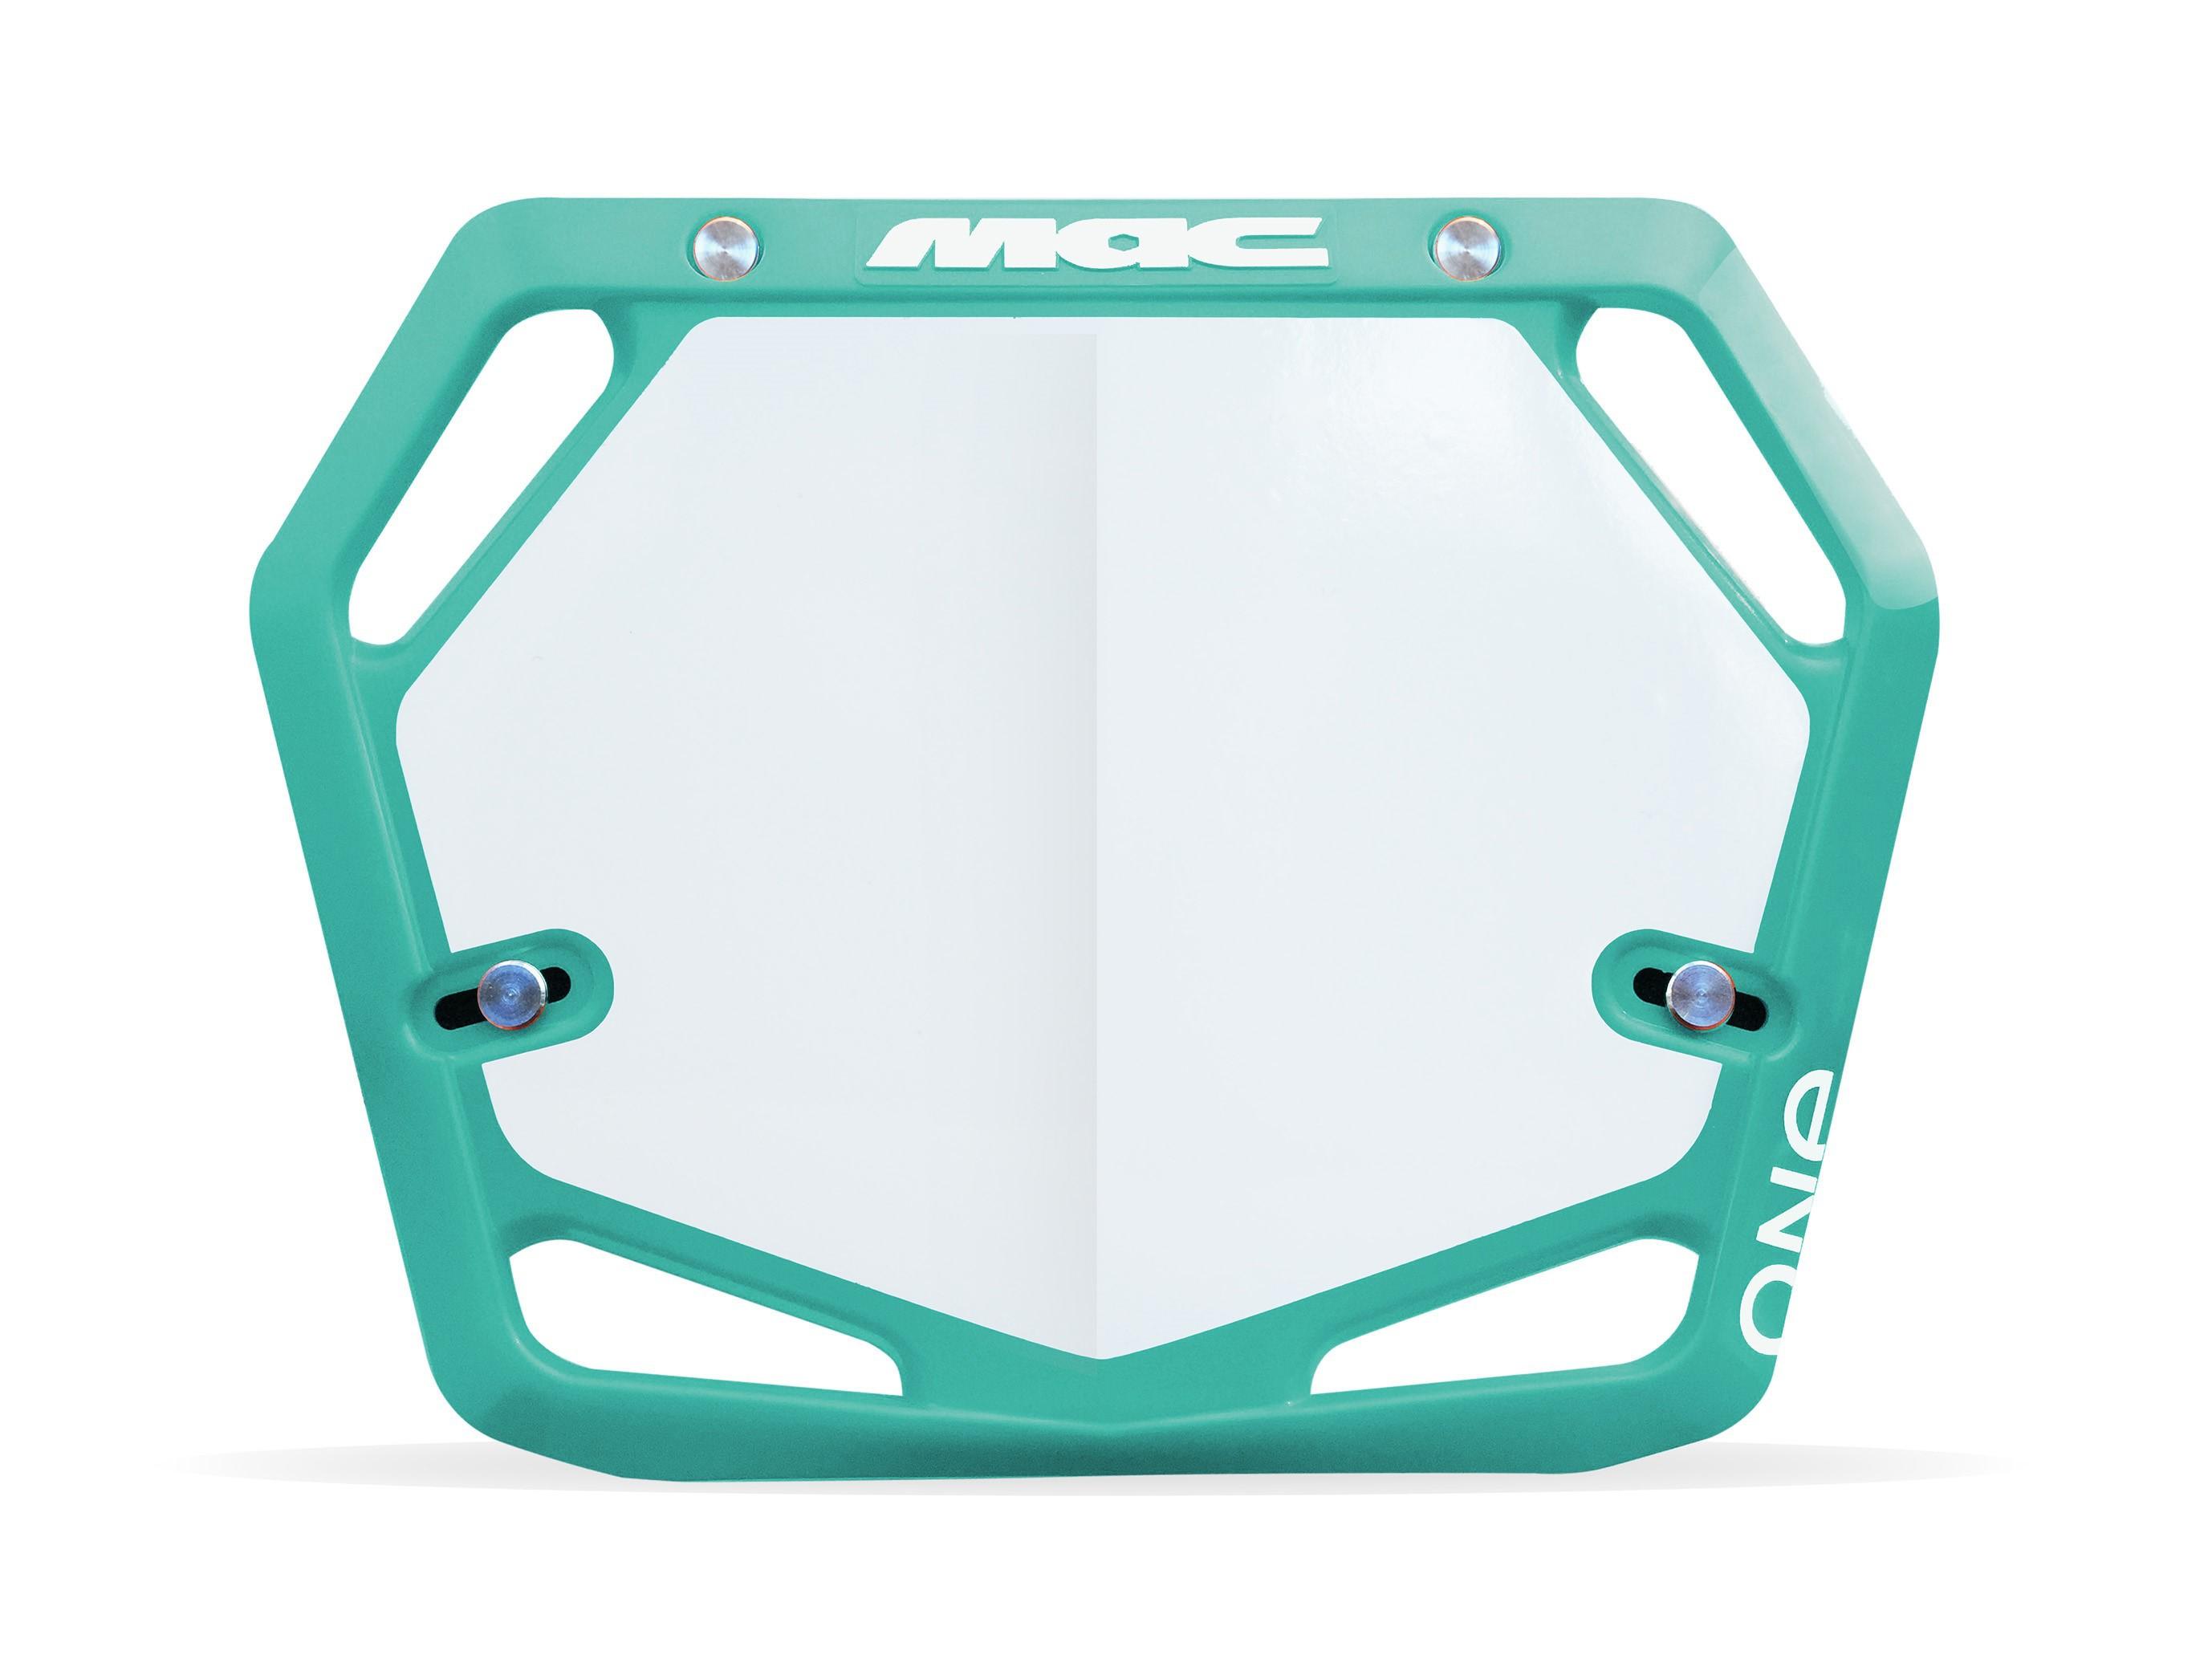 Plaque-pro-mac-component